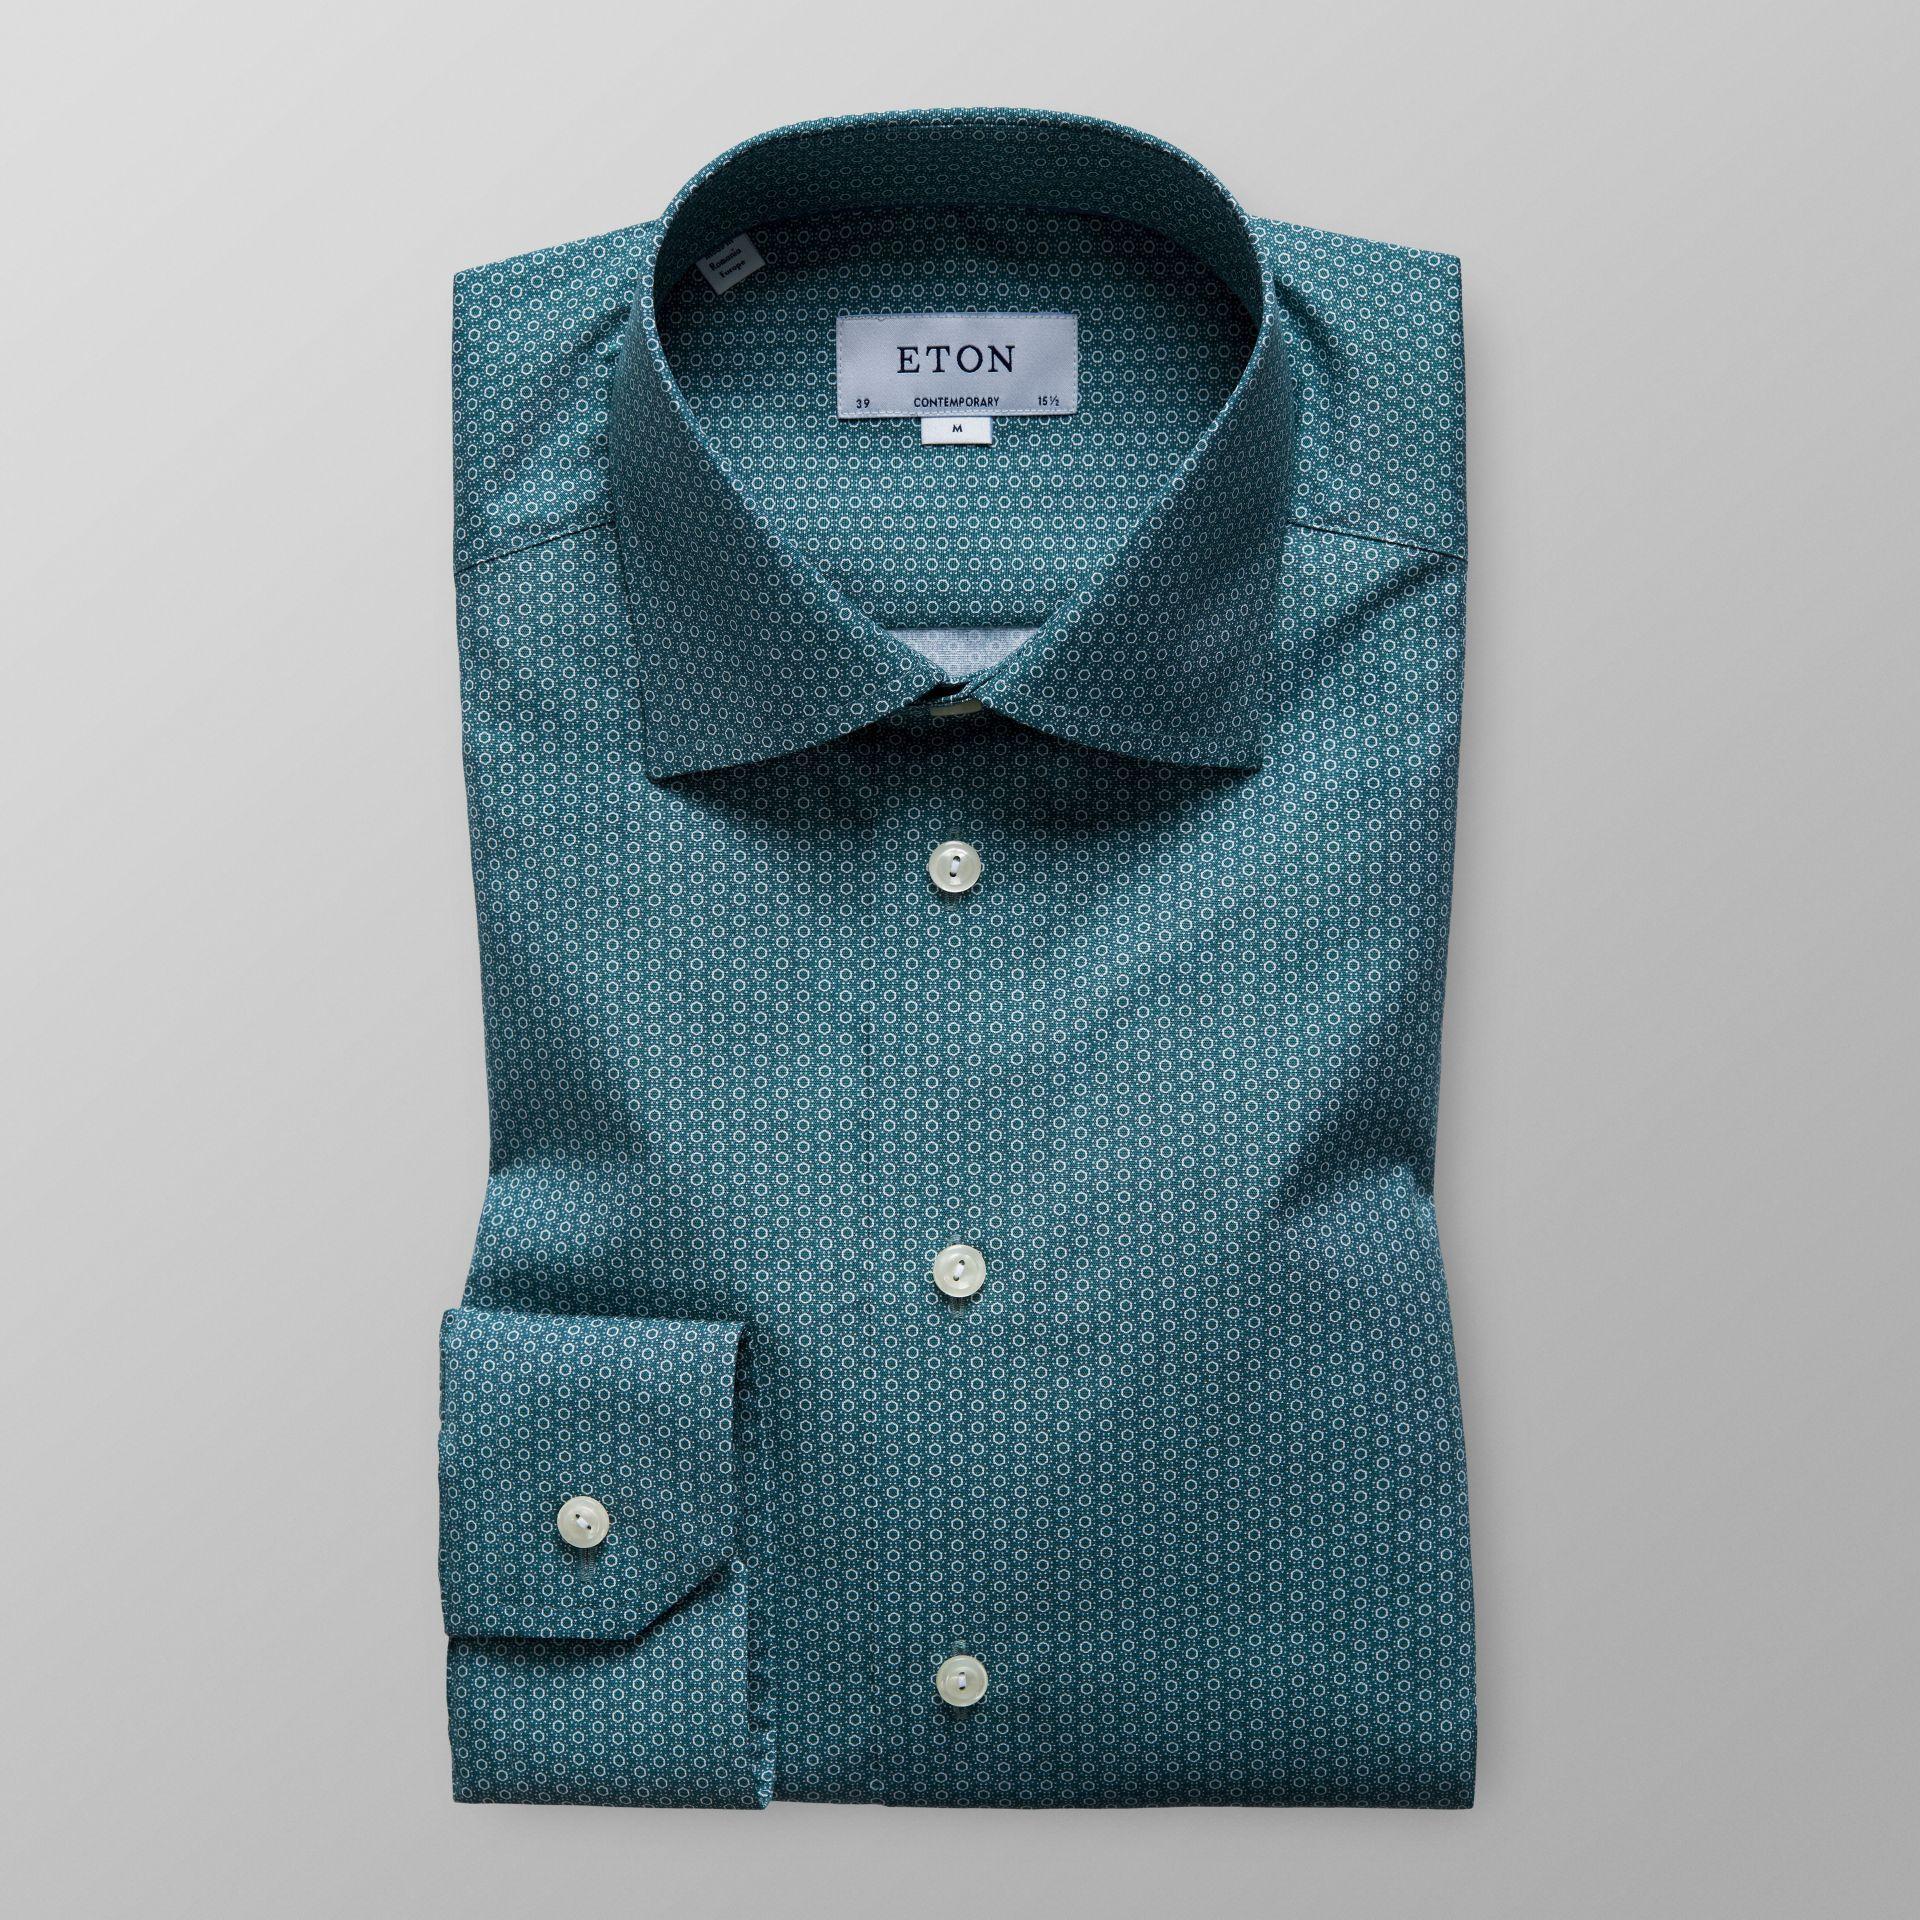 Green dress shirt mens Shirts in Contemporary Fit  Eton Shirts US  Модели рубашки  Pinterest